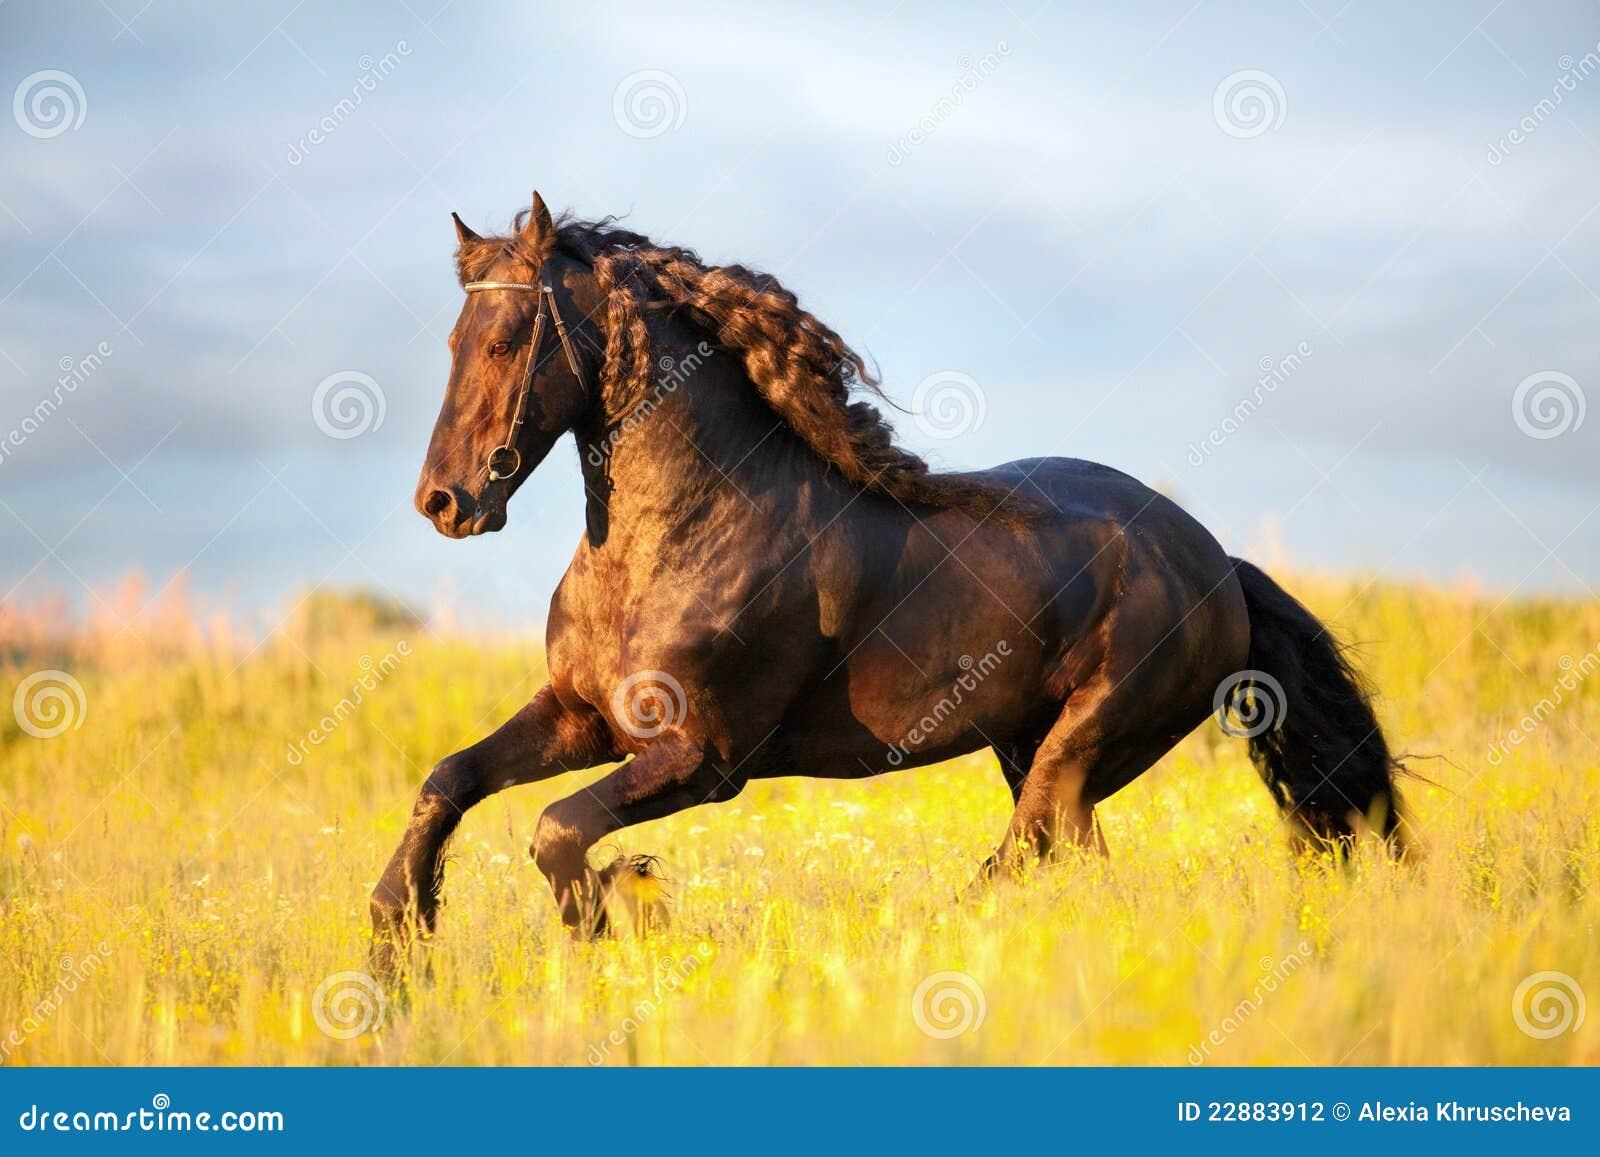 Friesian horse gallop in field